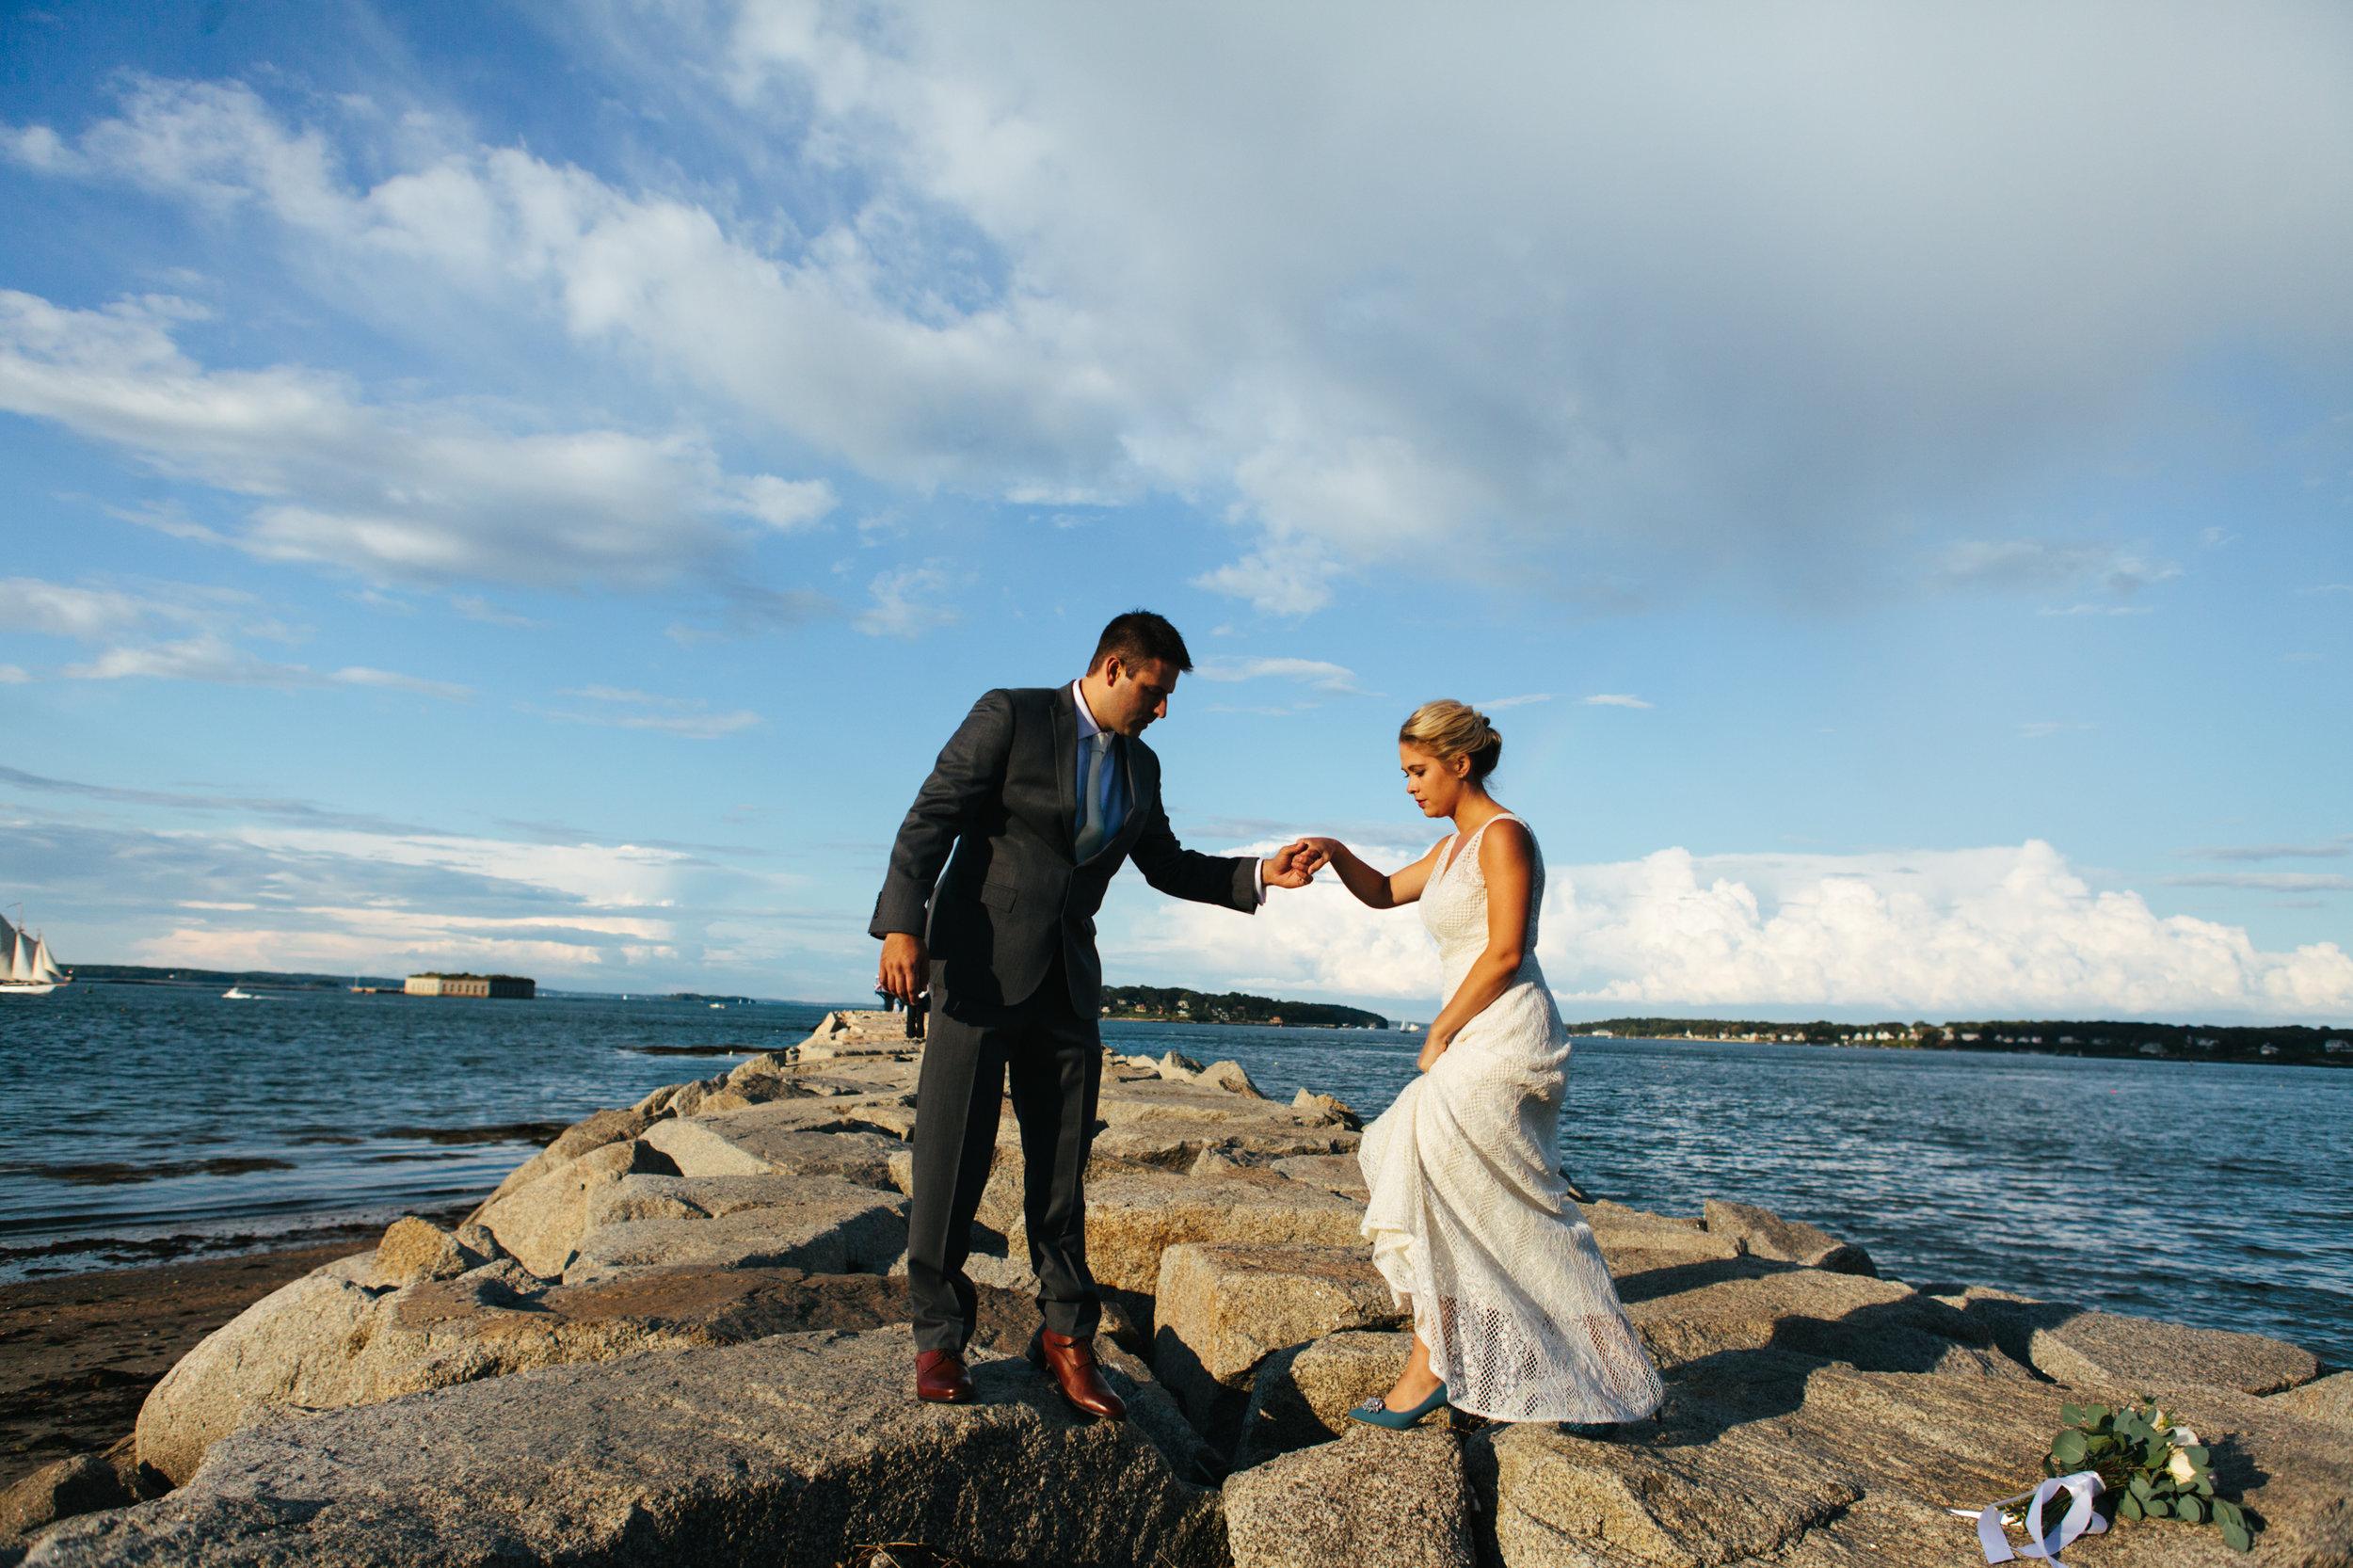 spring-point-ledge-lighthouse-wedding-south-portland-maine-2471.jpg